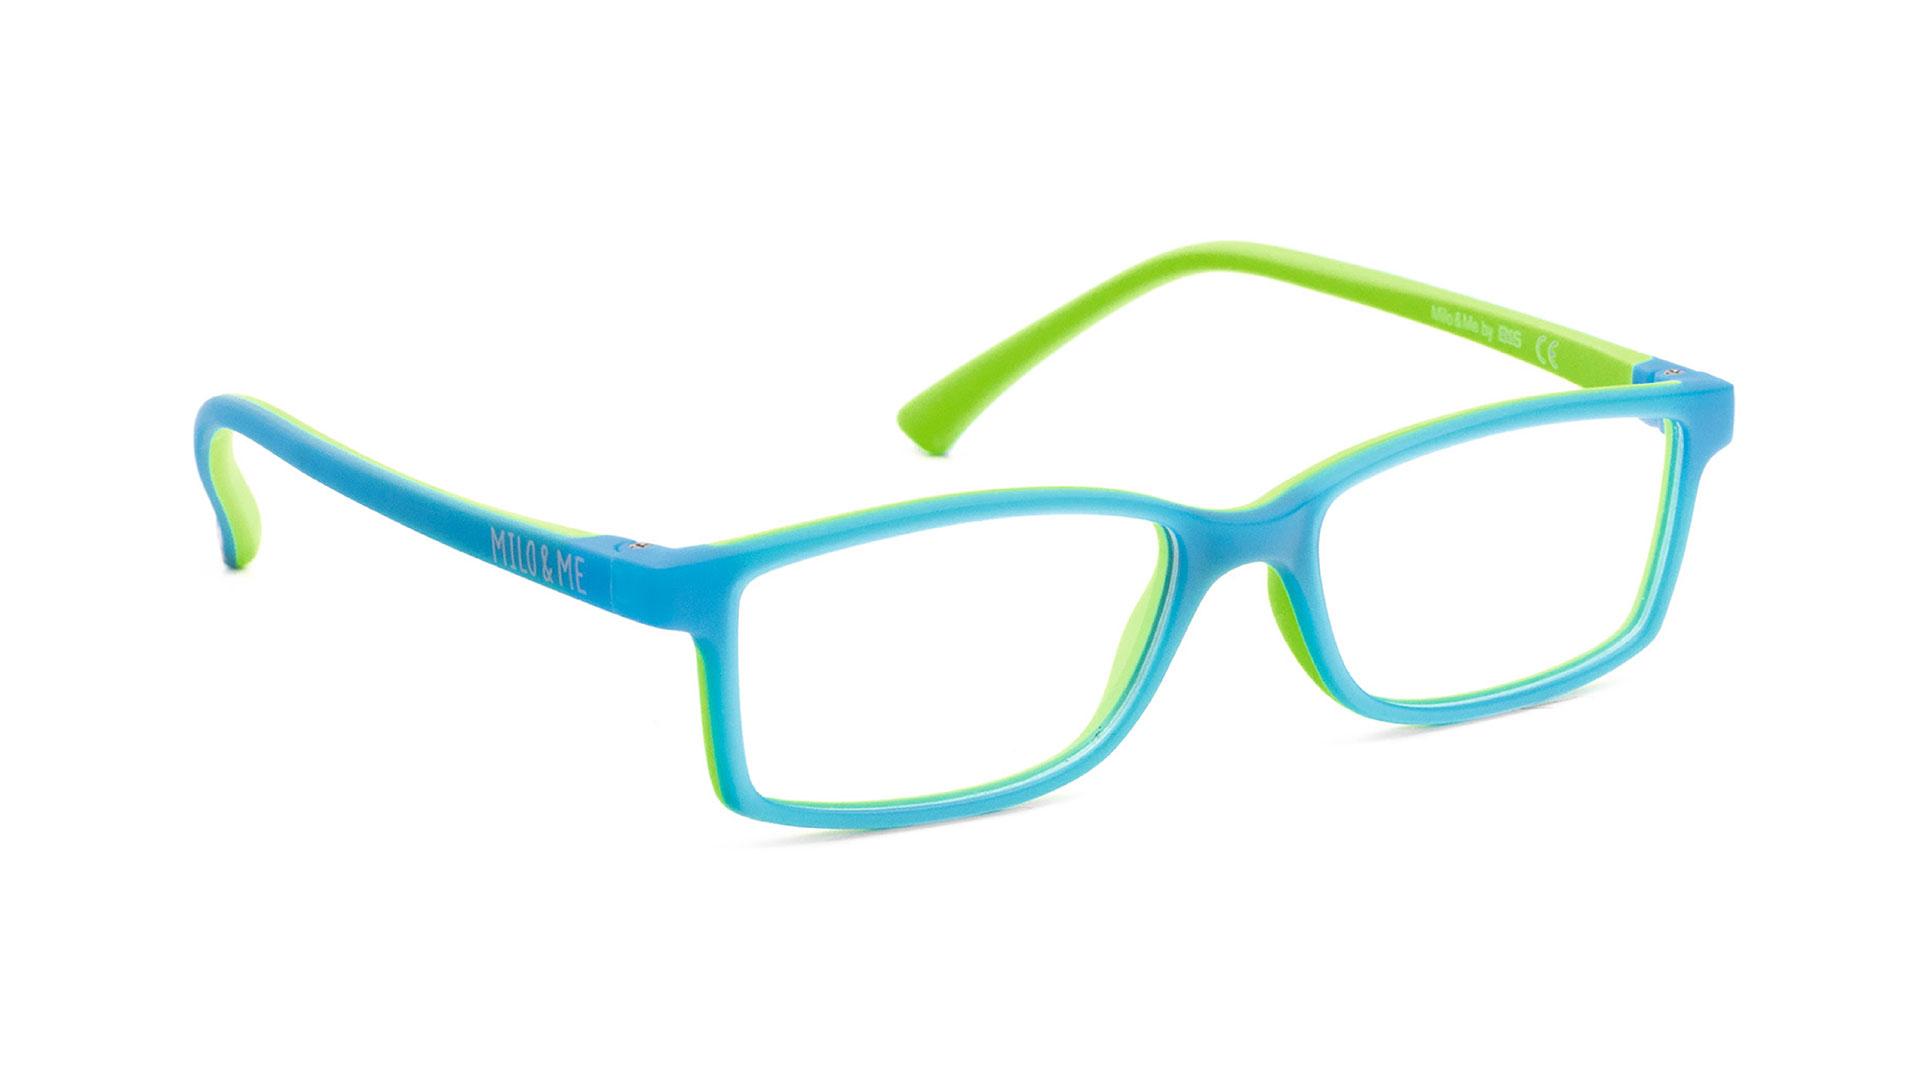 Light Blue-Apple Green H85010-26 - Milo & Me Eyewear - Optimum RX Lens Specialists